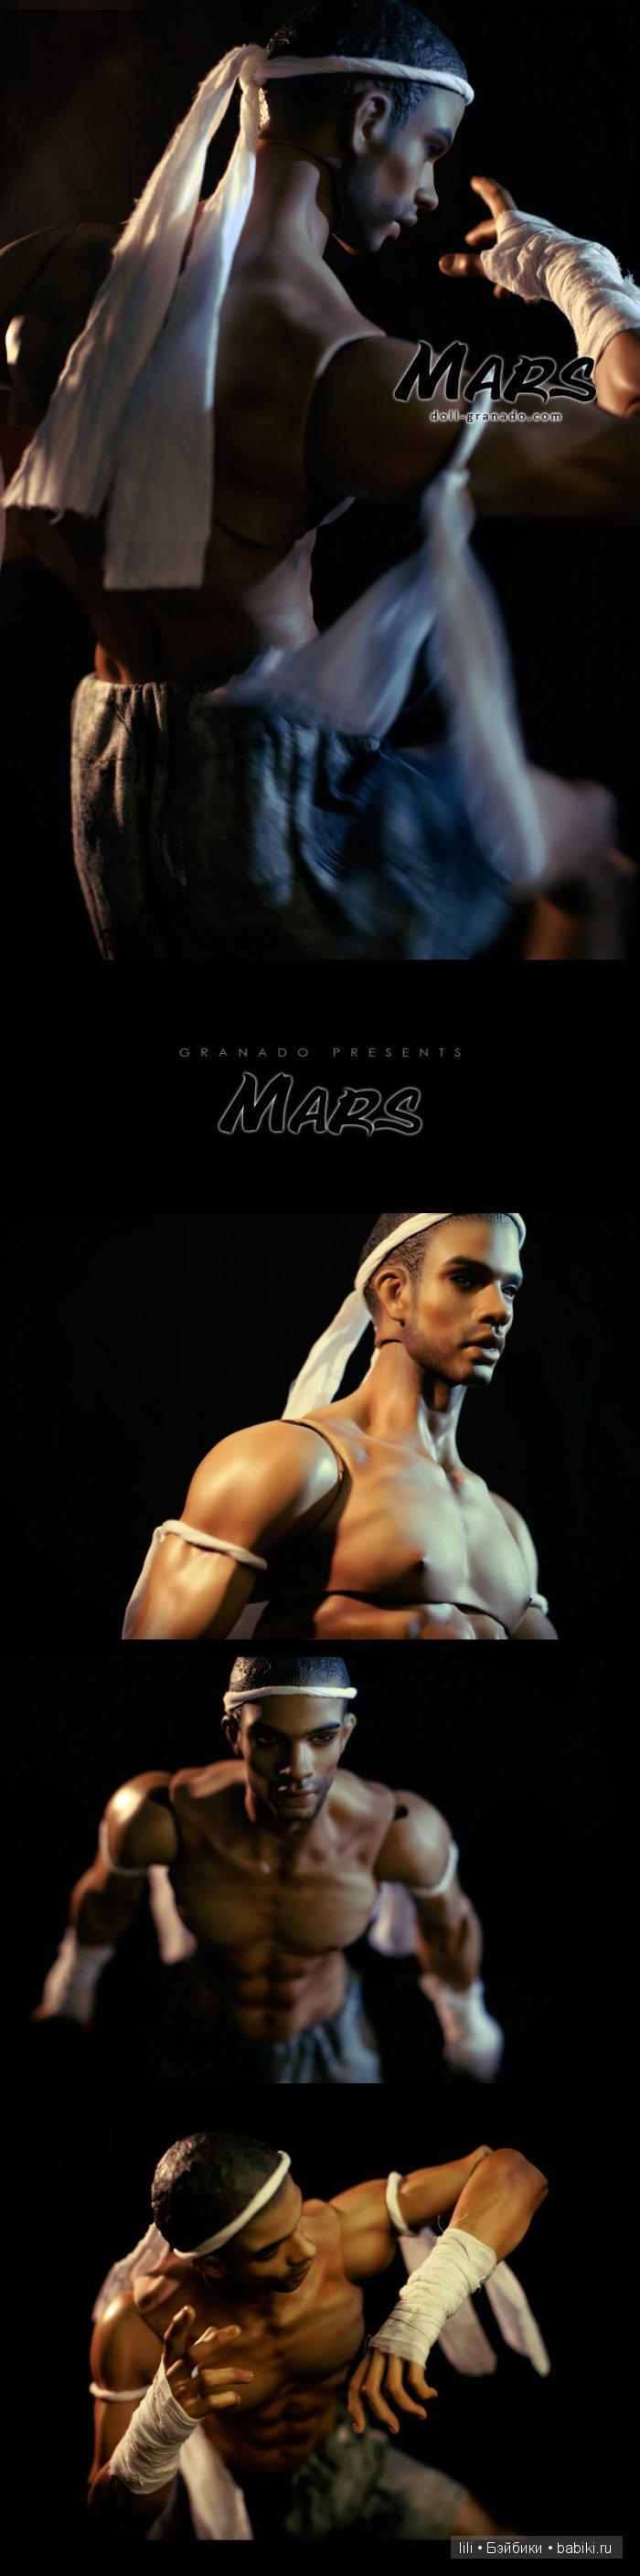 БЖД парень - Марс от doll-granado